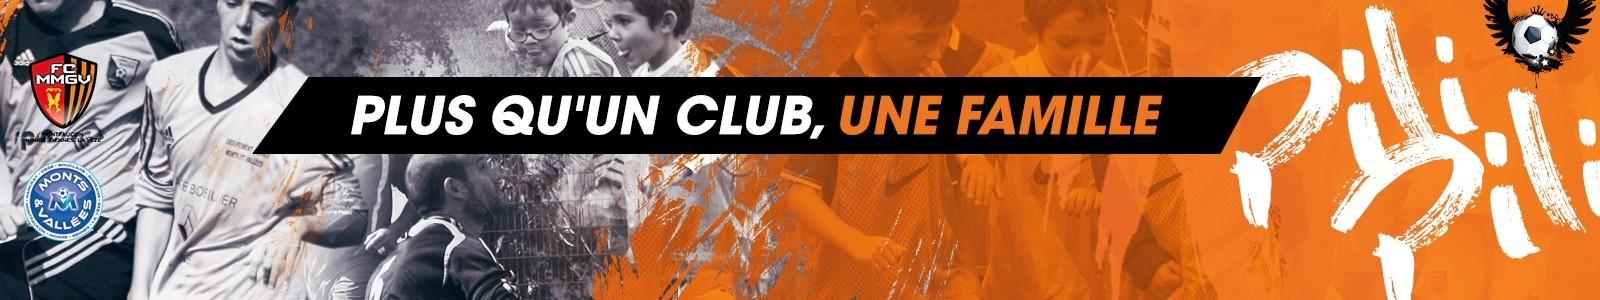 Football Club Montfaucon Morre Gennes La Vèze : site officiel du club de foot de MONTFAUCON - footeo